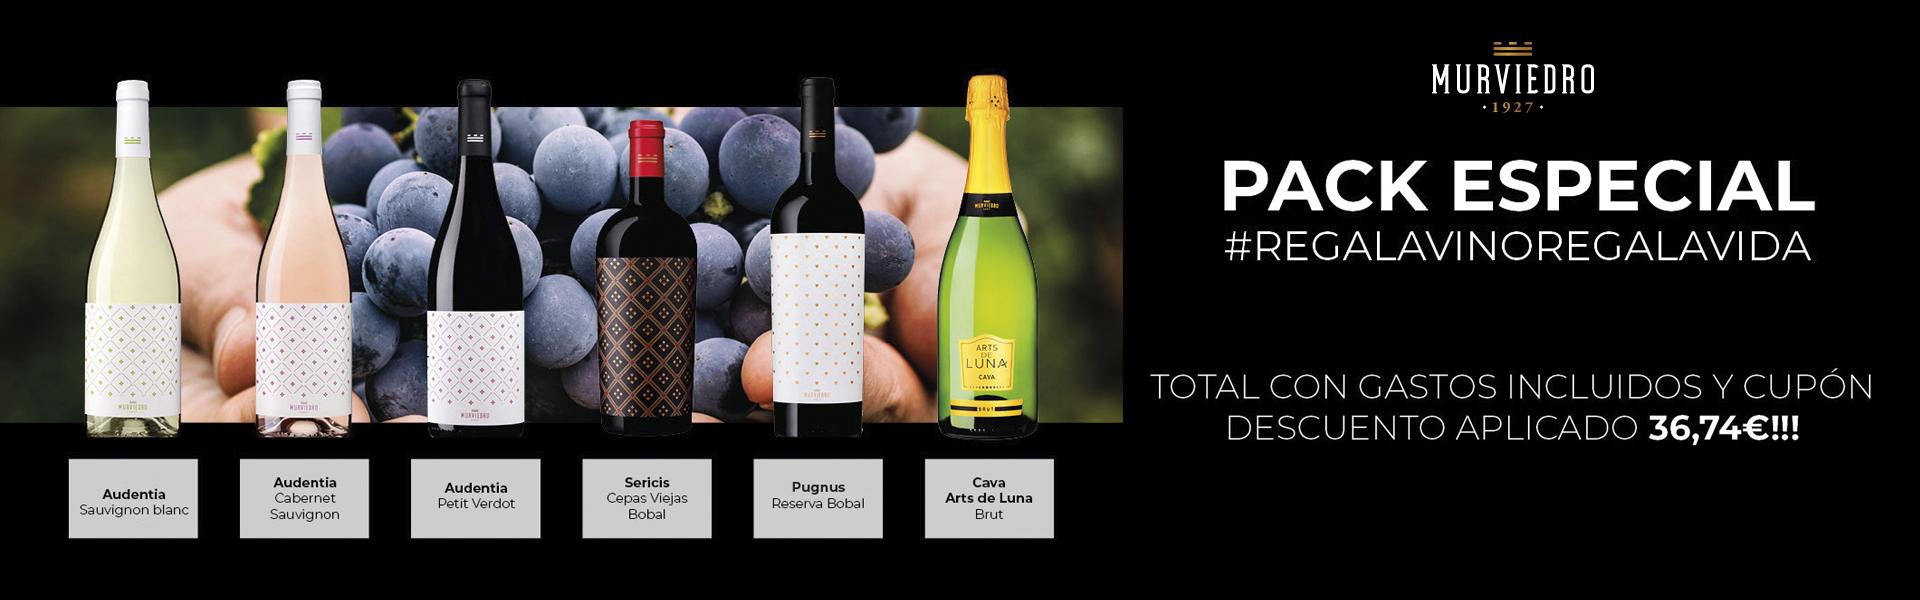 Pack espevial de vino Murviedro #RegalaVinoRegalaVida